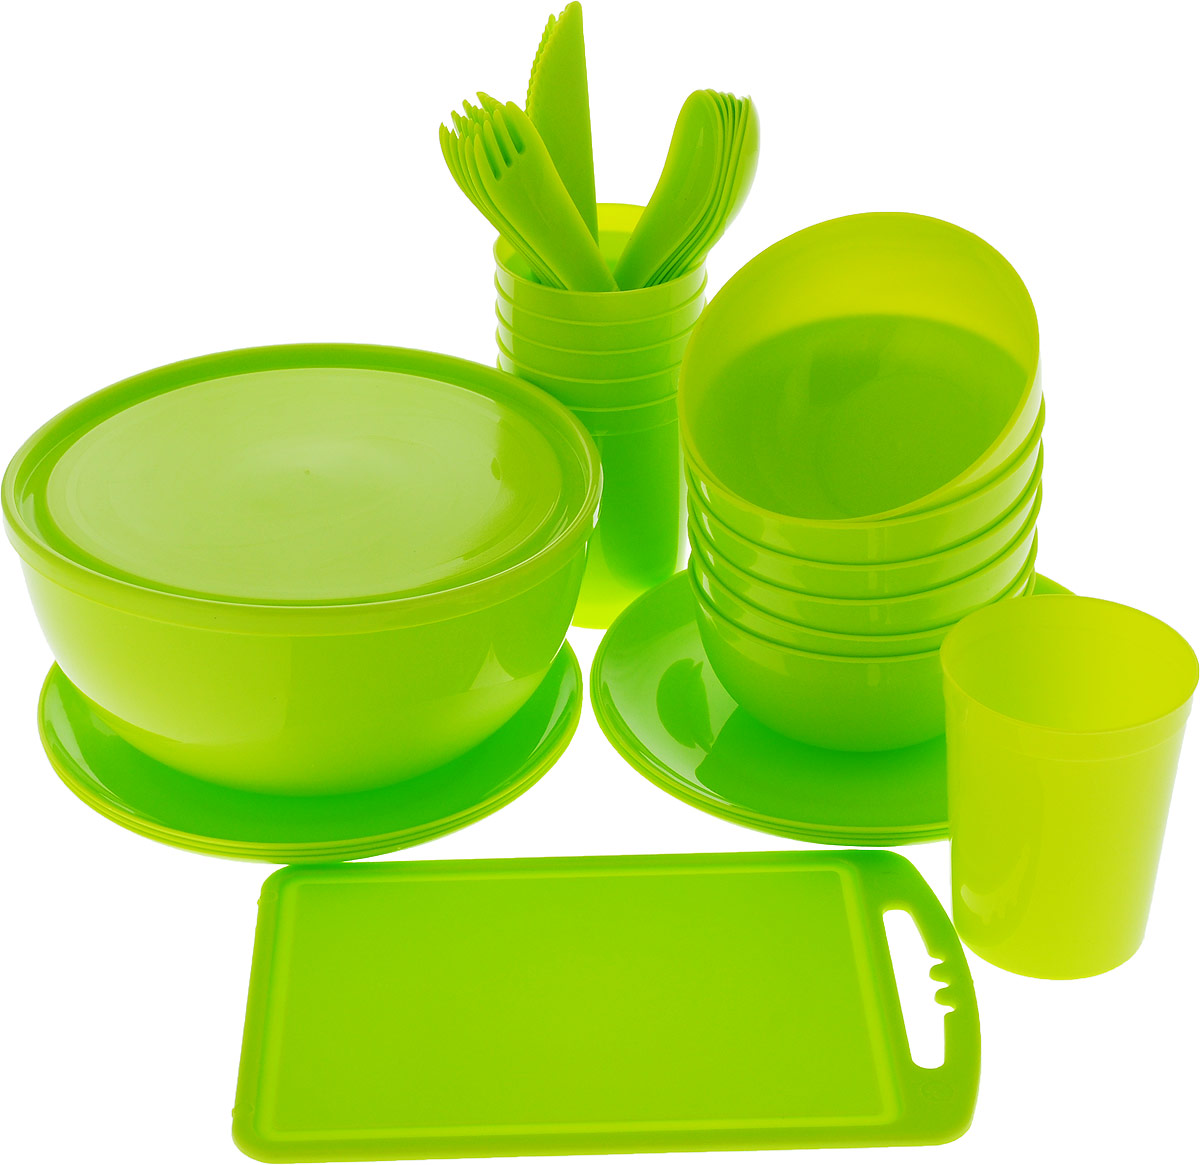 Набор для пикника Идеал  Plastic Centre, на 6 персон, 38 предметов набор для пикника на 6 персон picnic ca8477